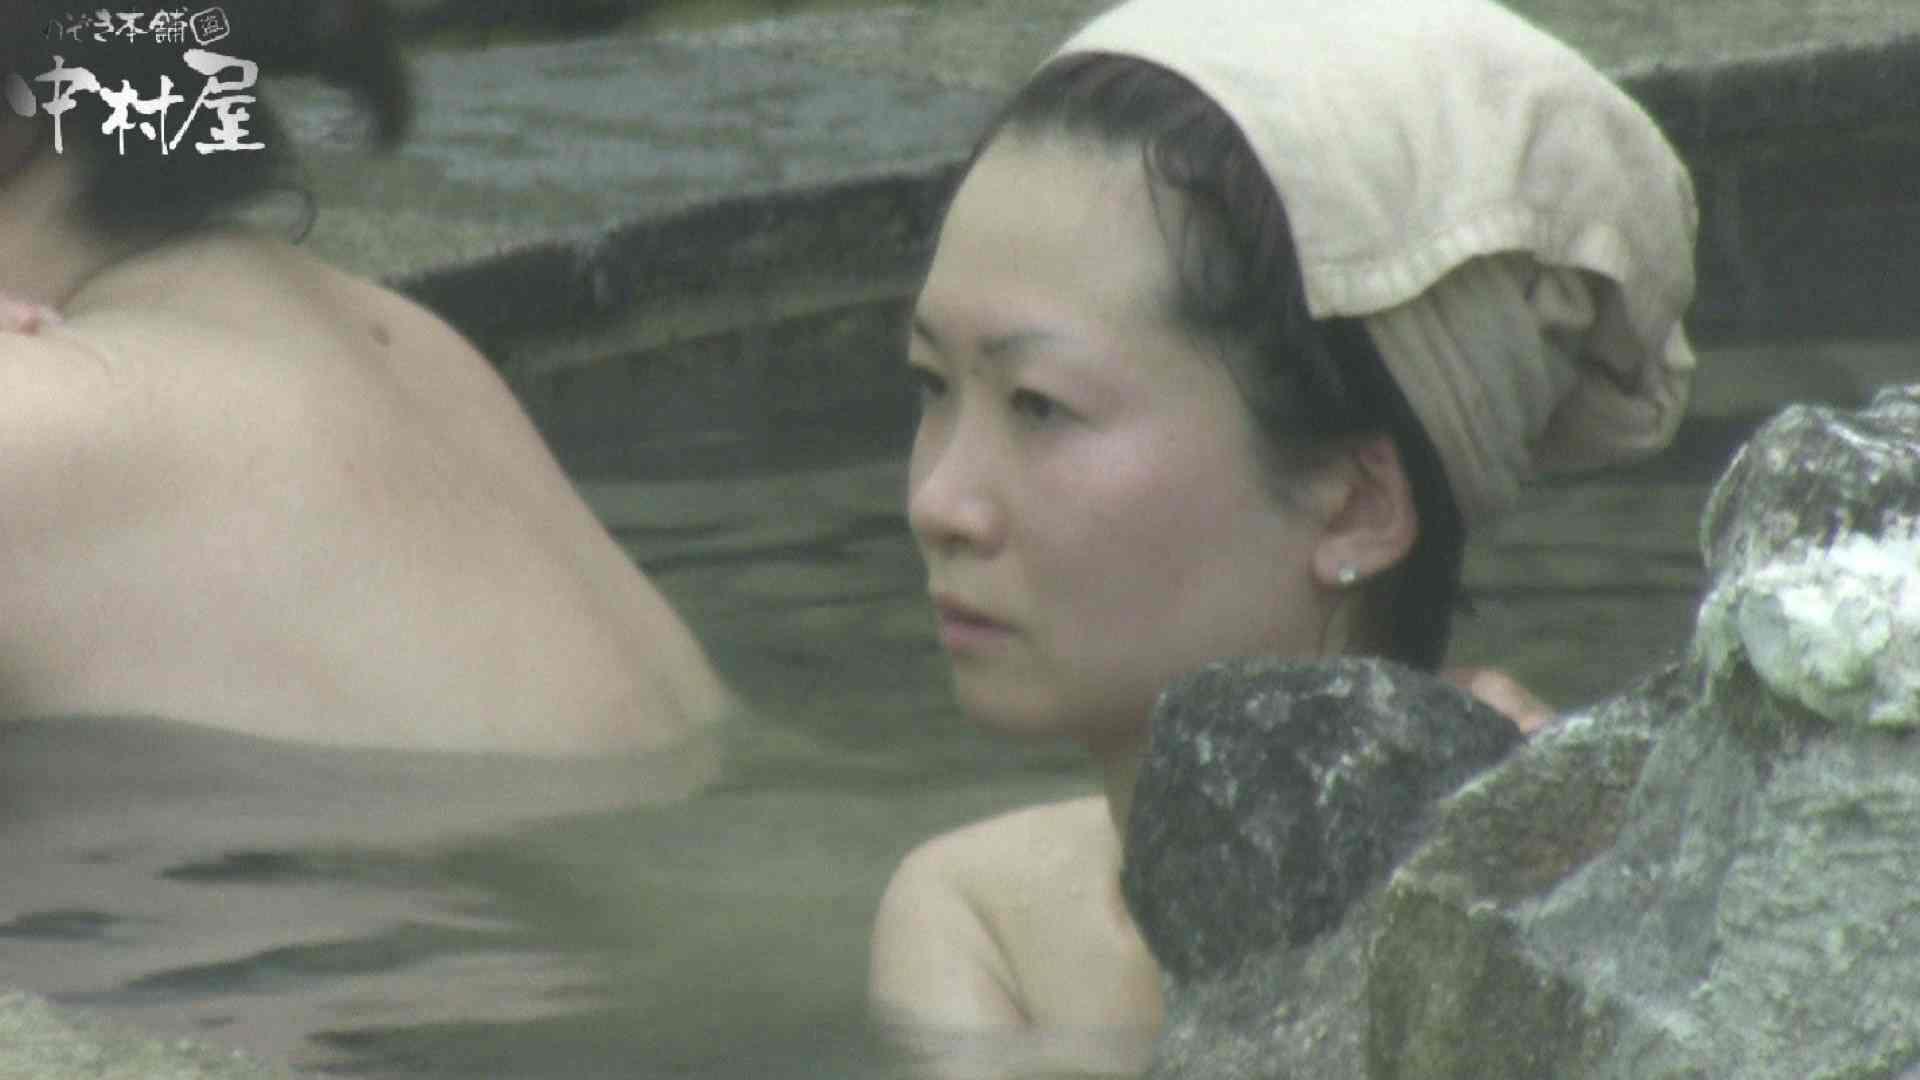 Aquaな露天風呂Vol.906 OLセックス 盗撮オマンコ無修正動画無料 92画像 89